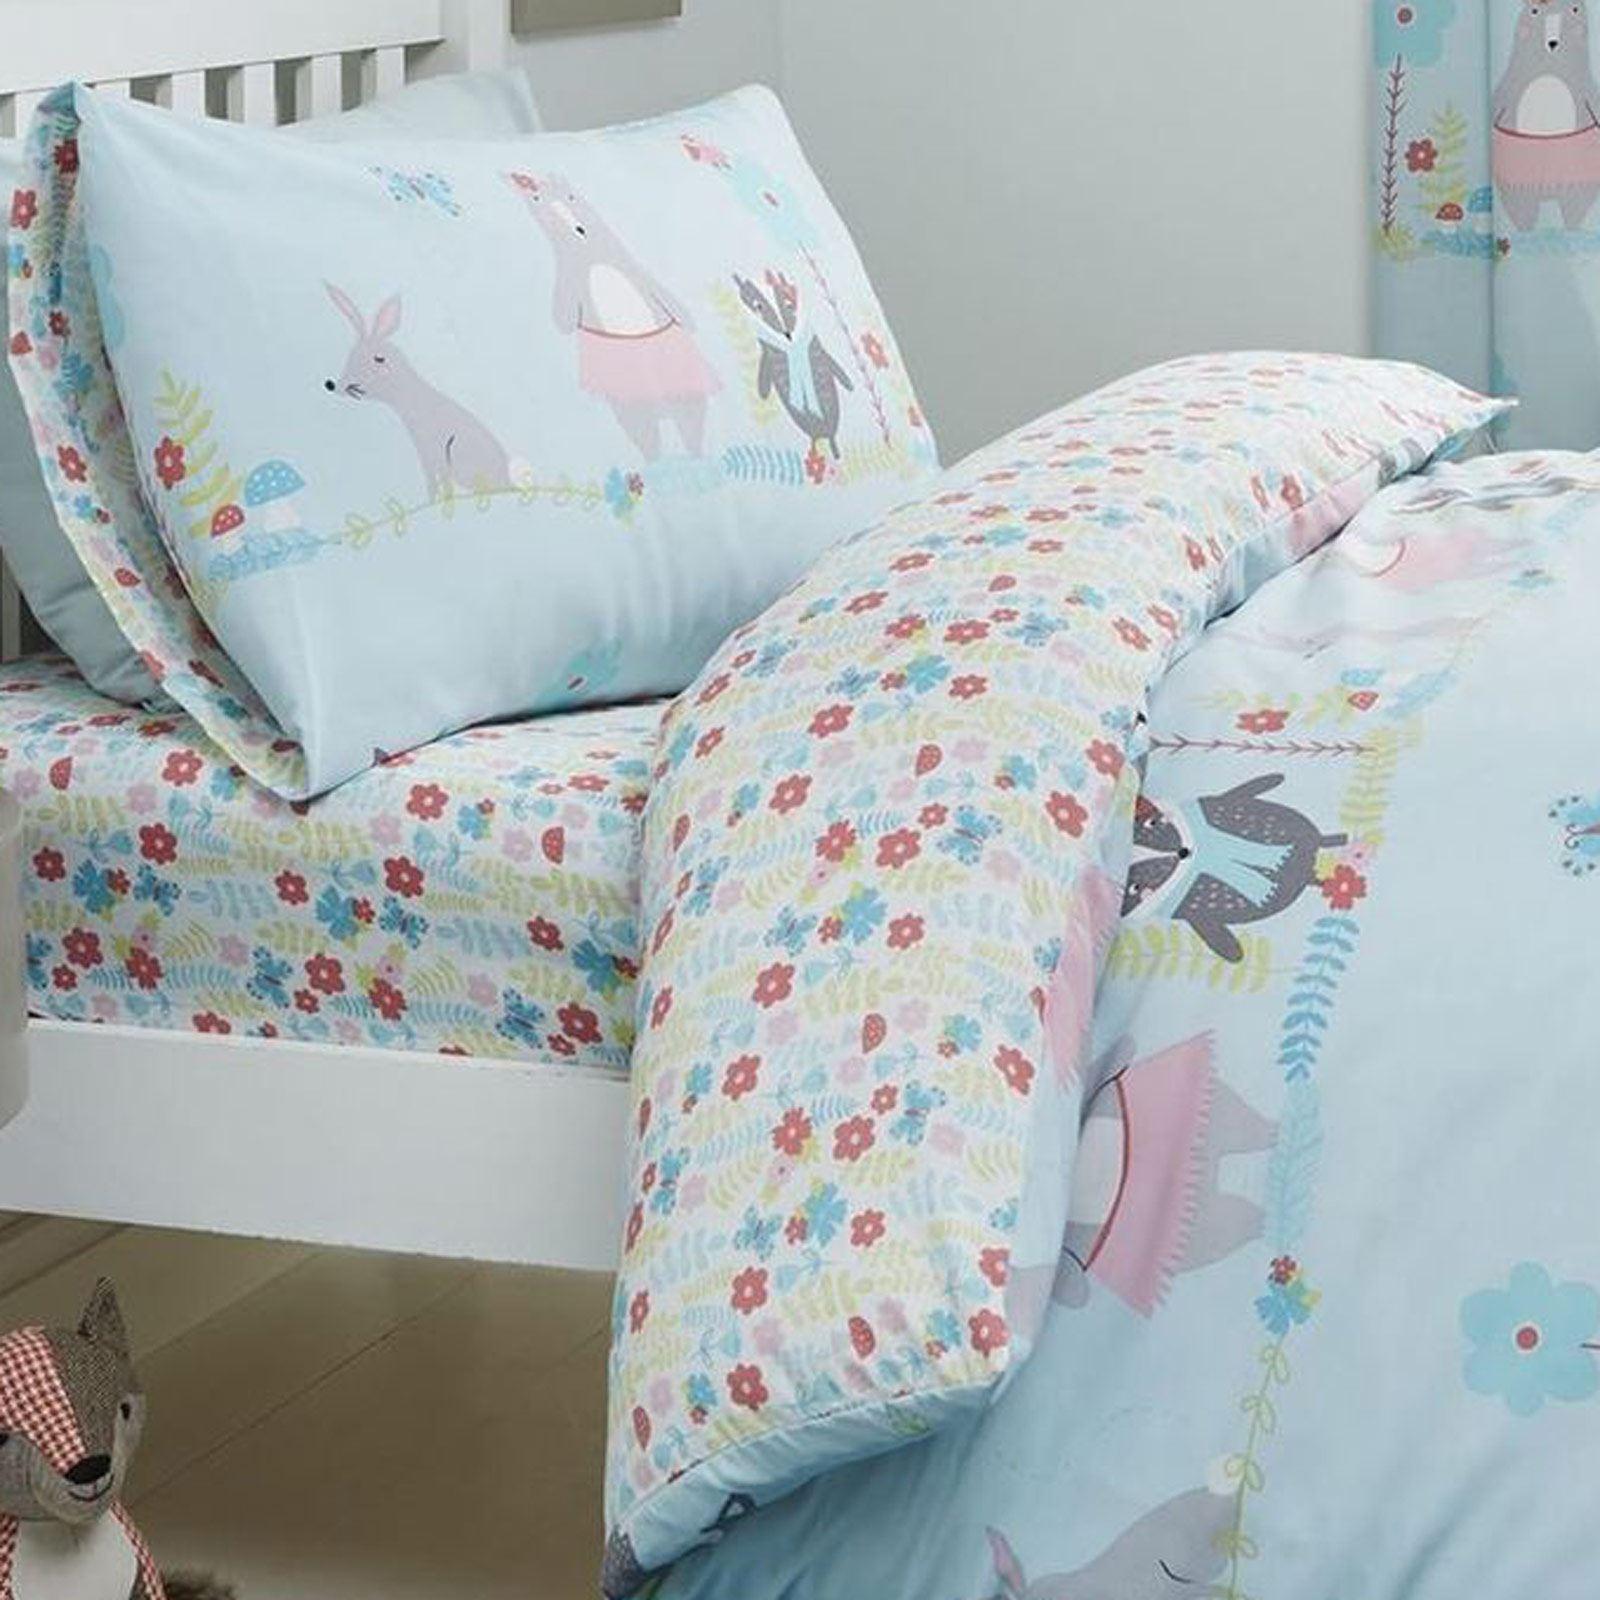 Kids-Duvet-Covers-Blue-Woodland-Animals-Cute-Reversible-Print-Quilt-Bedding-Sets thumbnail 7